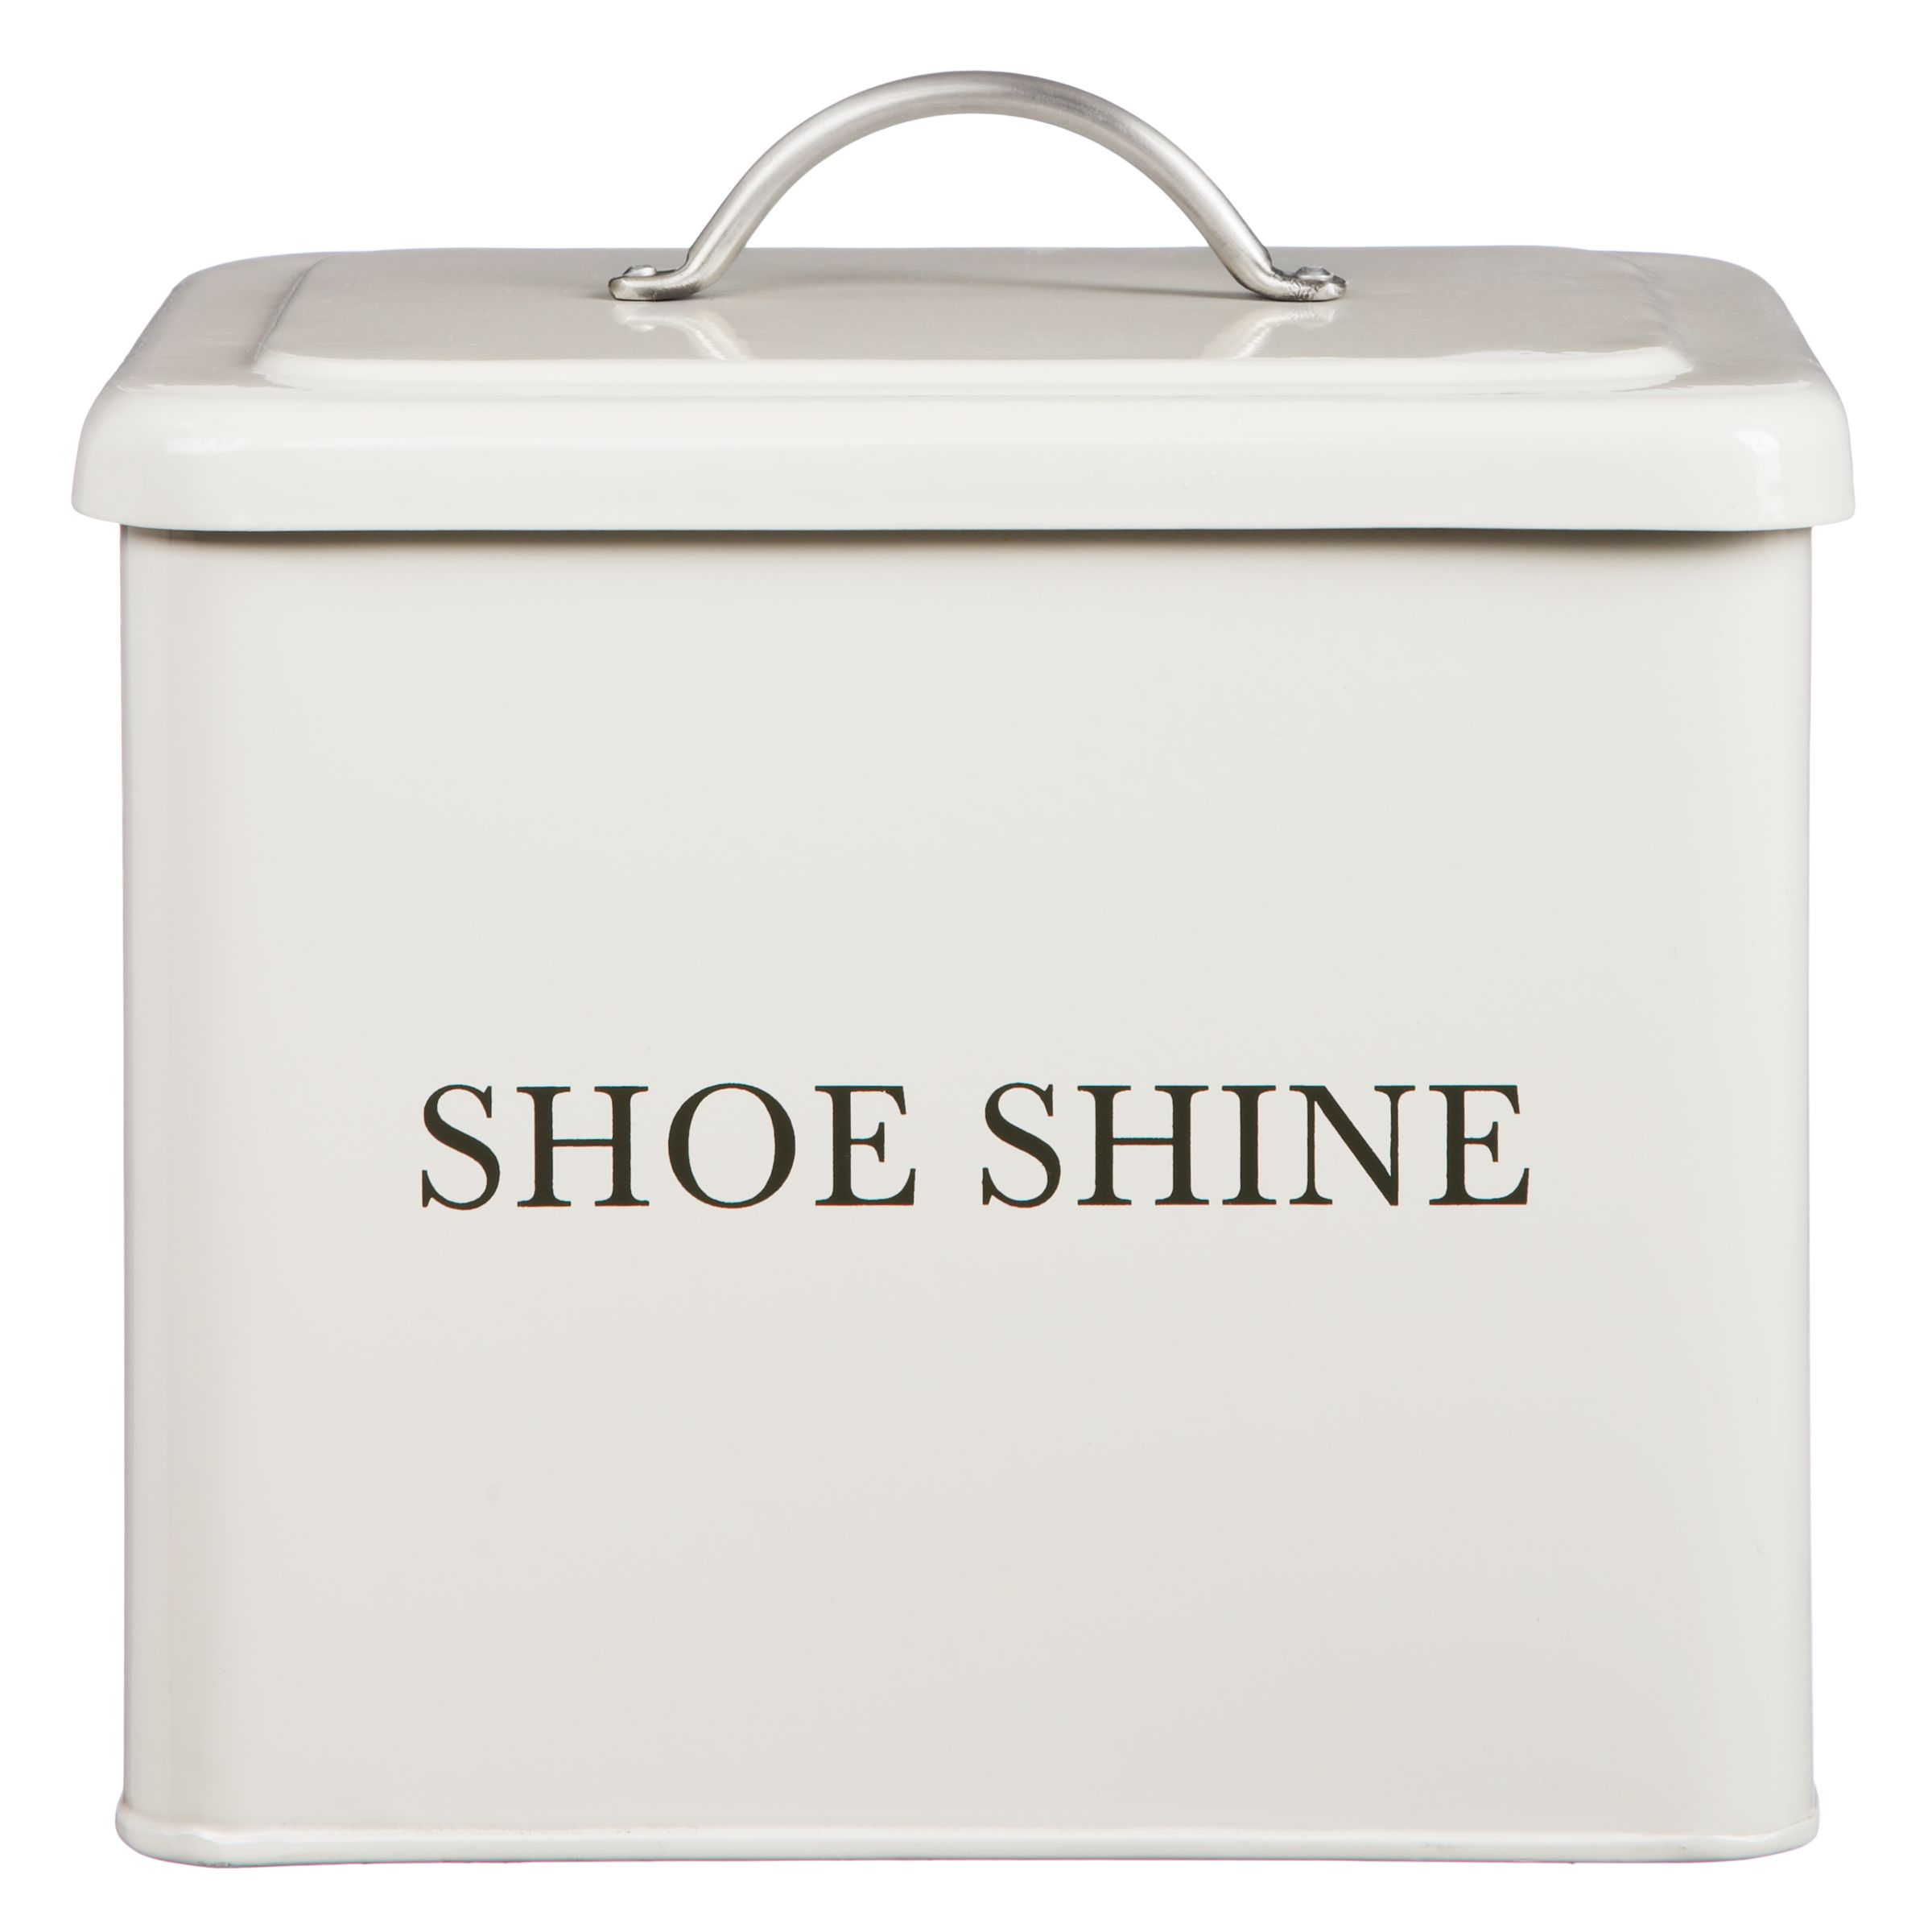 Garden Trading Garden Trading Shoe Shine Box, Chalk